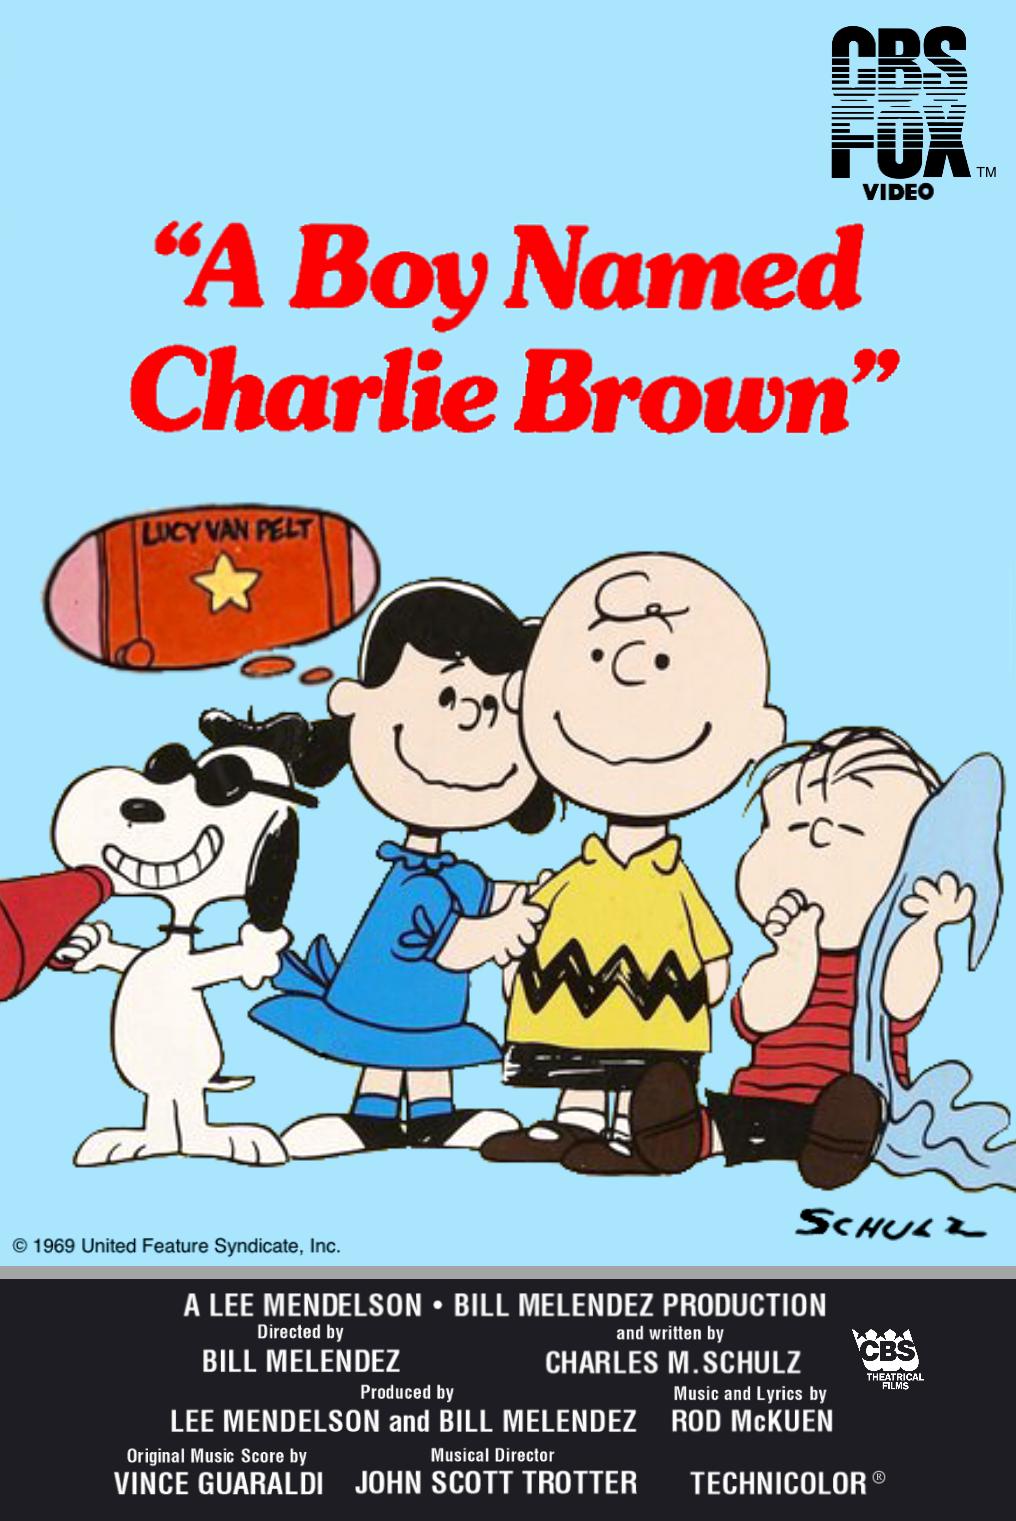 A Boy Named Charlie Brown (1983-1992 VHS)